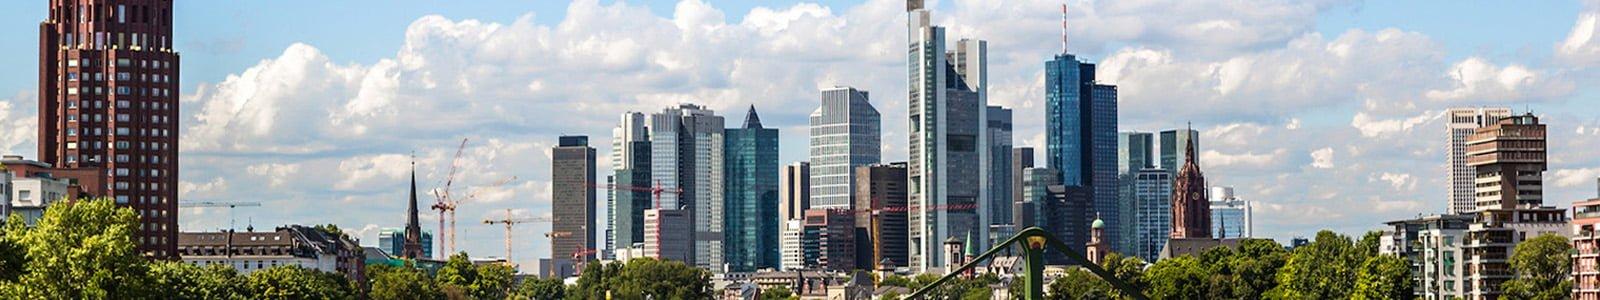 News & studies by cometis AG, Frankfurt am Main